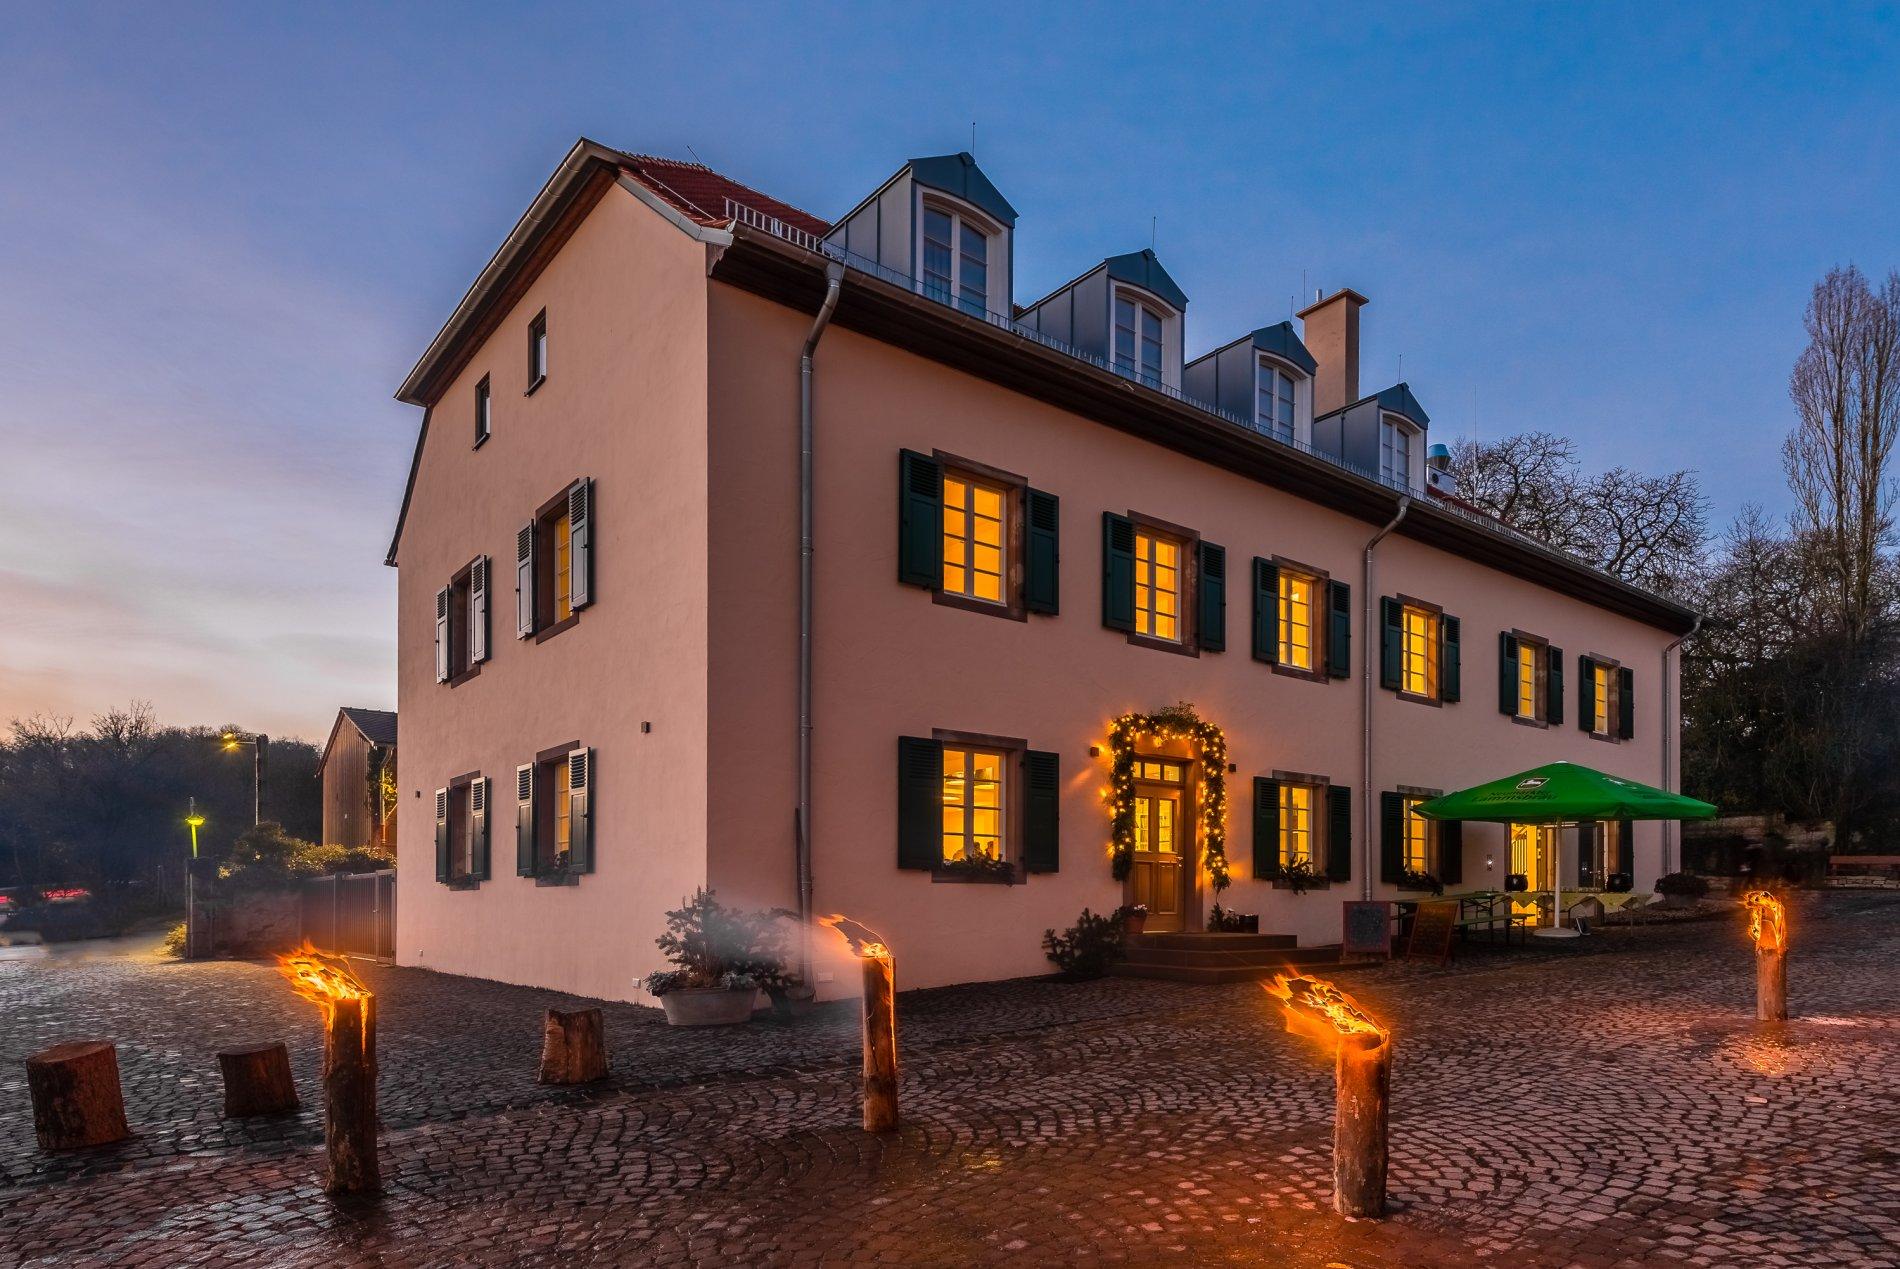 Landgasthaus Wintringer Hof